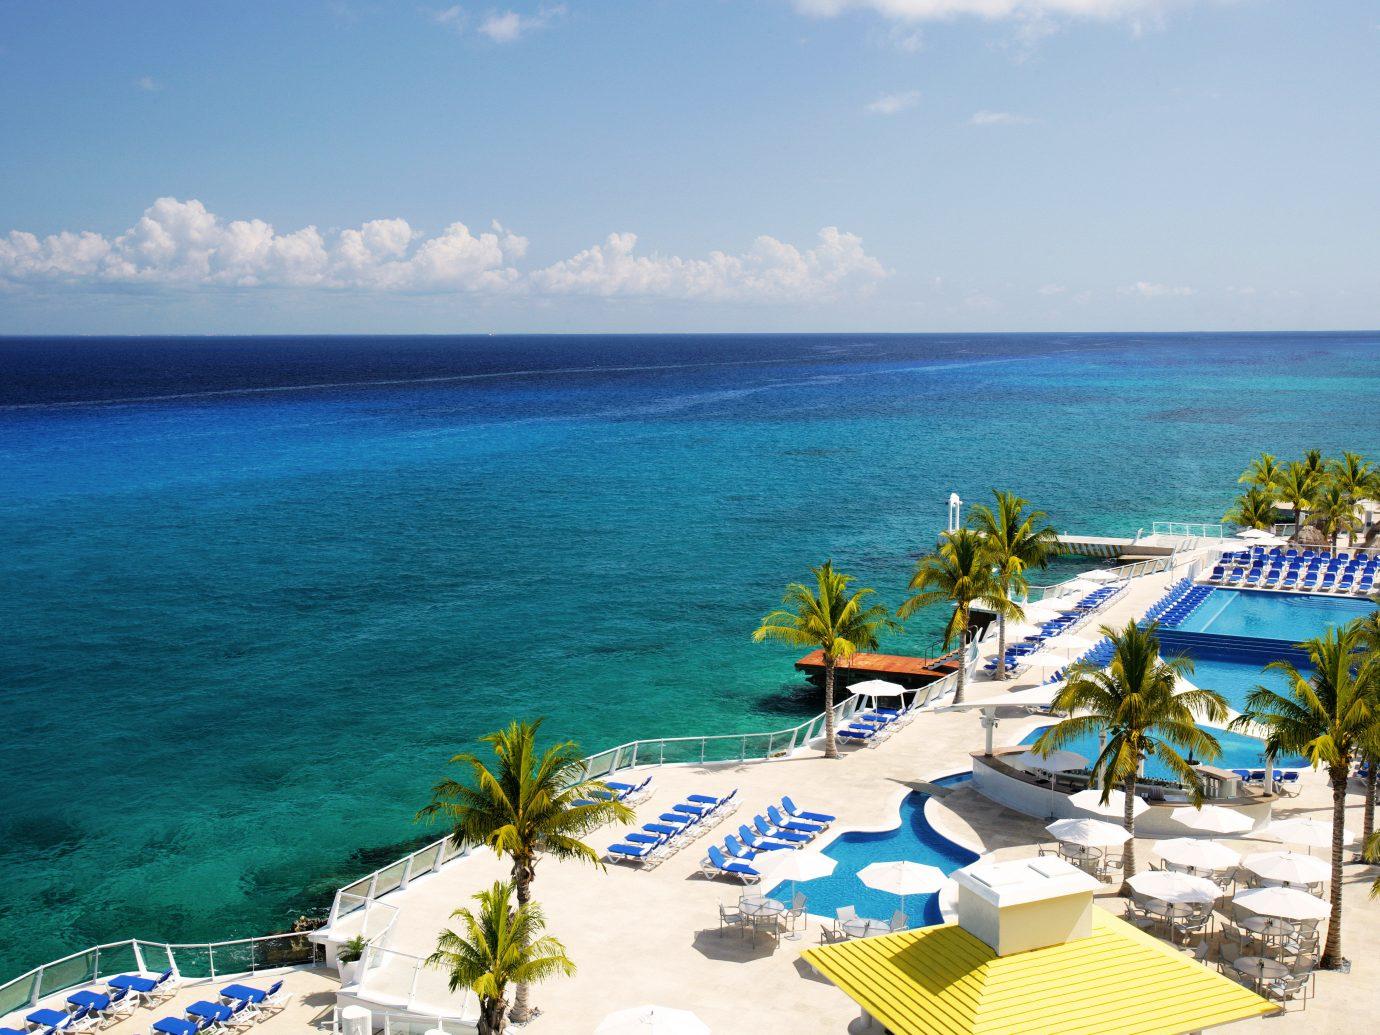 All-inclusive Beachfront Deck Hotels Lounge Luxury Pool Romance water sky umbrella outdoor Ocean Beach Sea leisure caribbean vacation Nature Coast Resort tourism cape bay shore Island islet Lagoon swimming day sandy